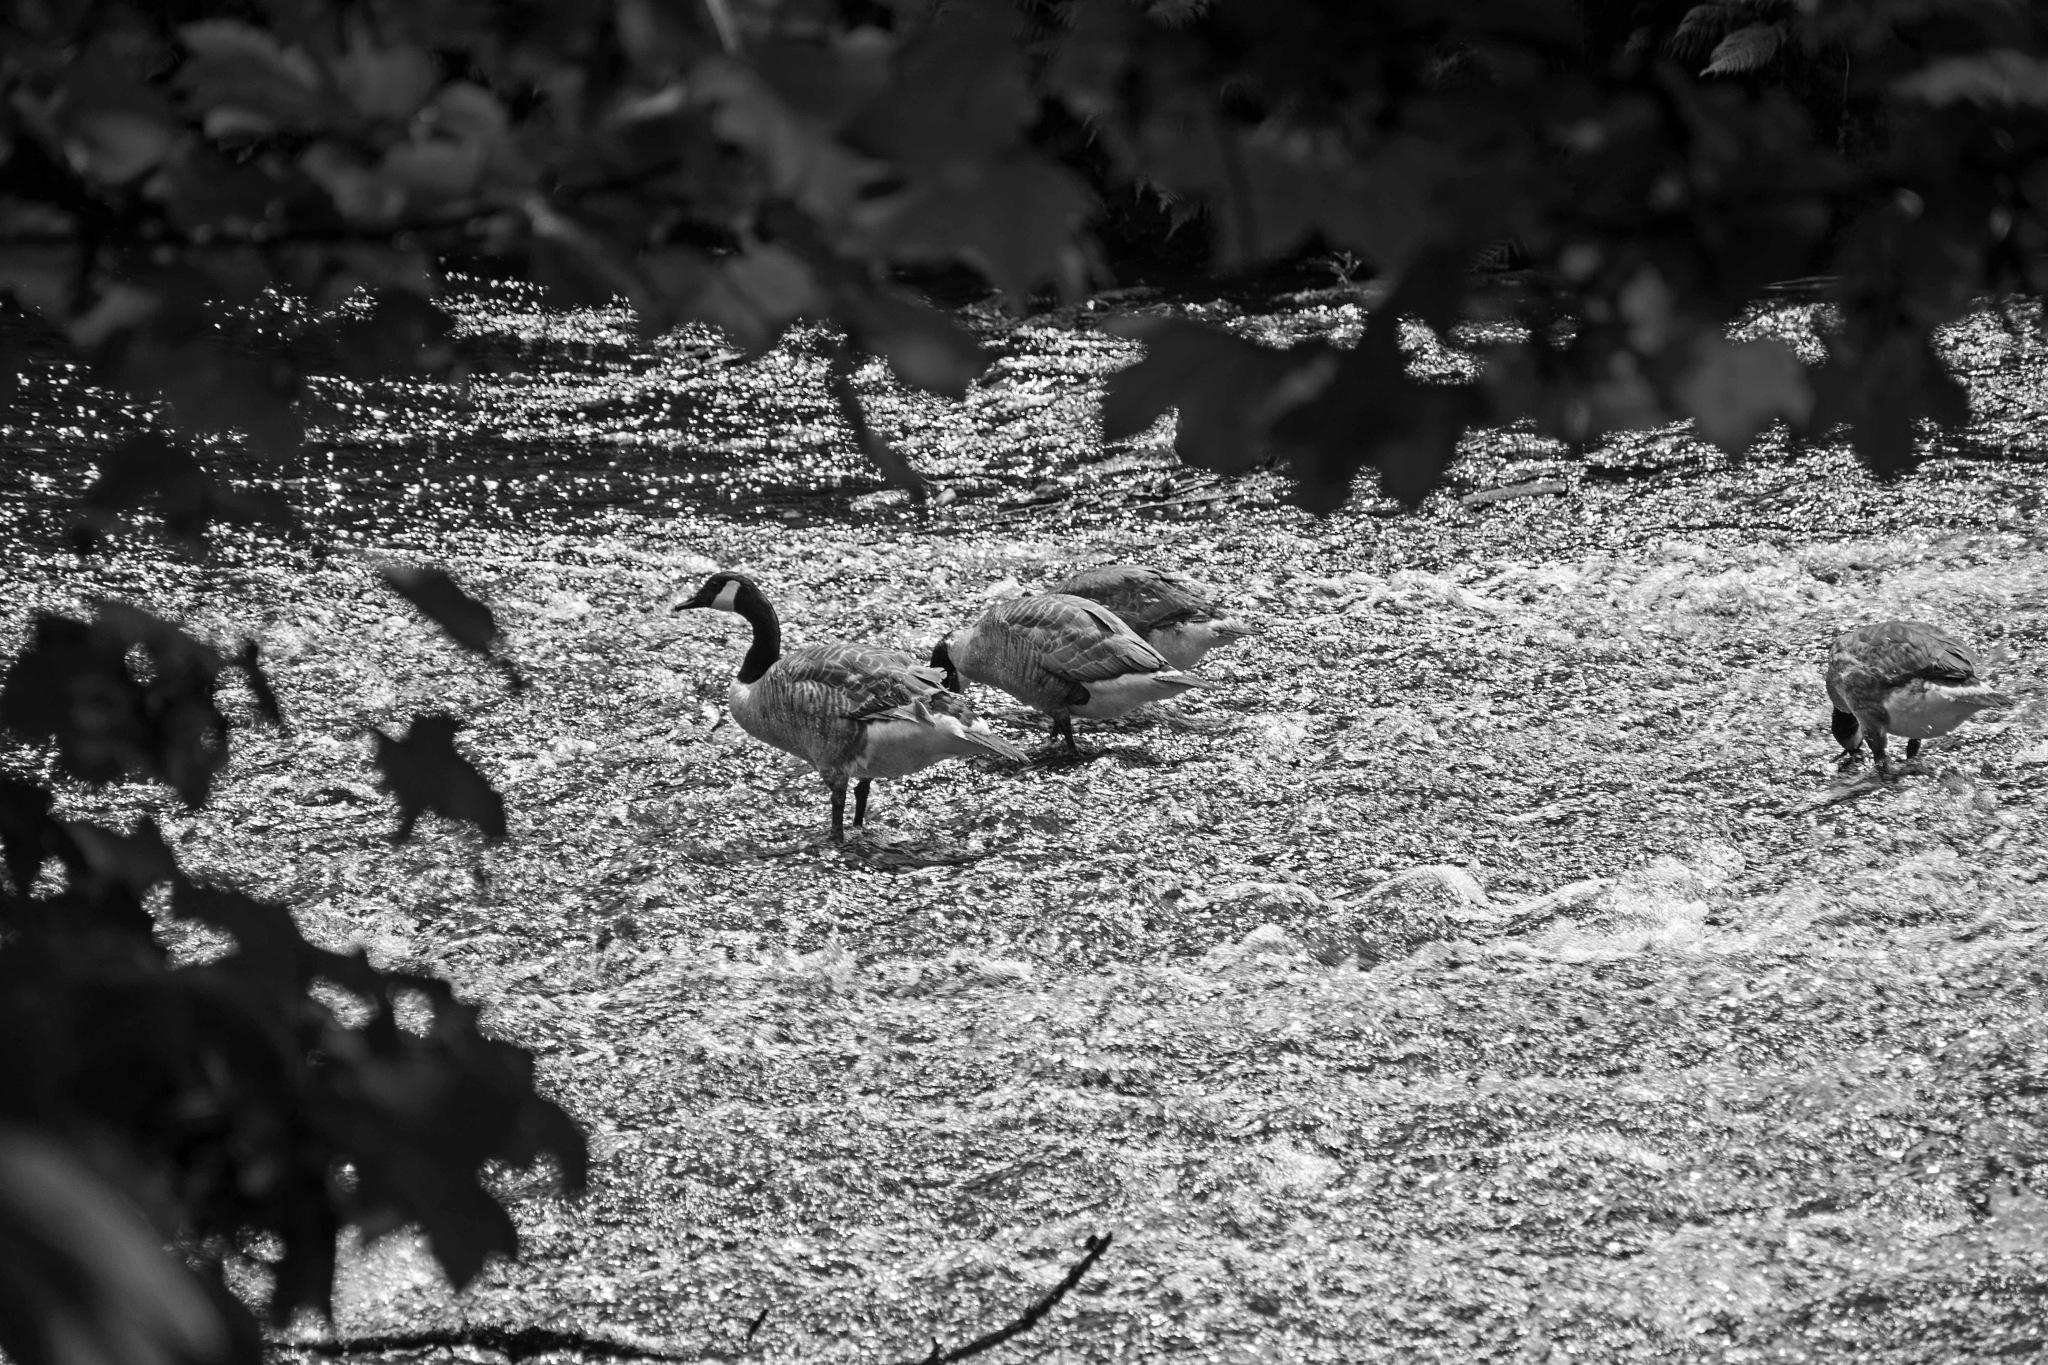 Canada Geese on a weir 2 by ianjck